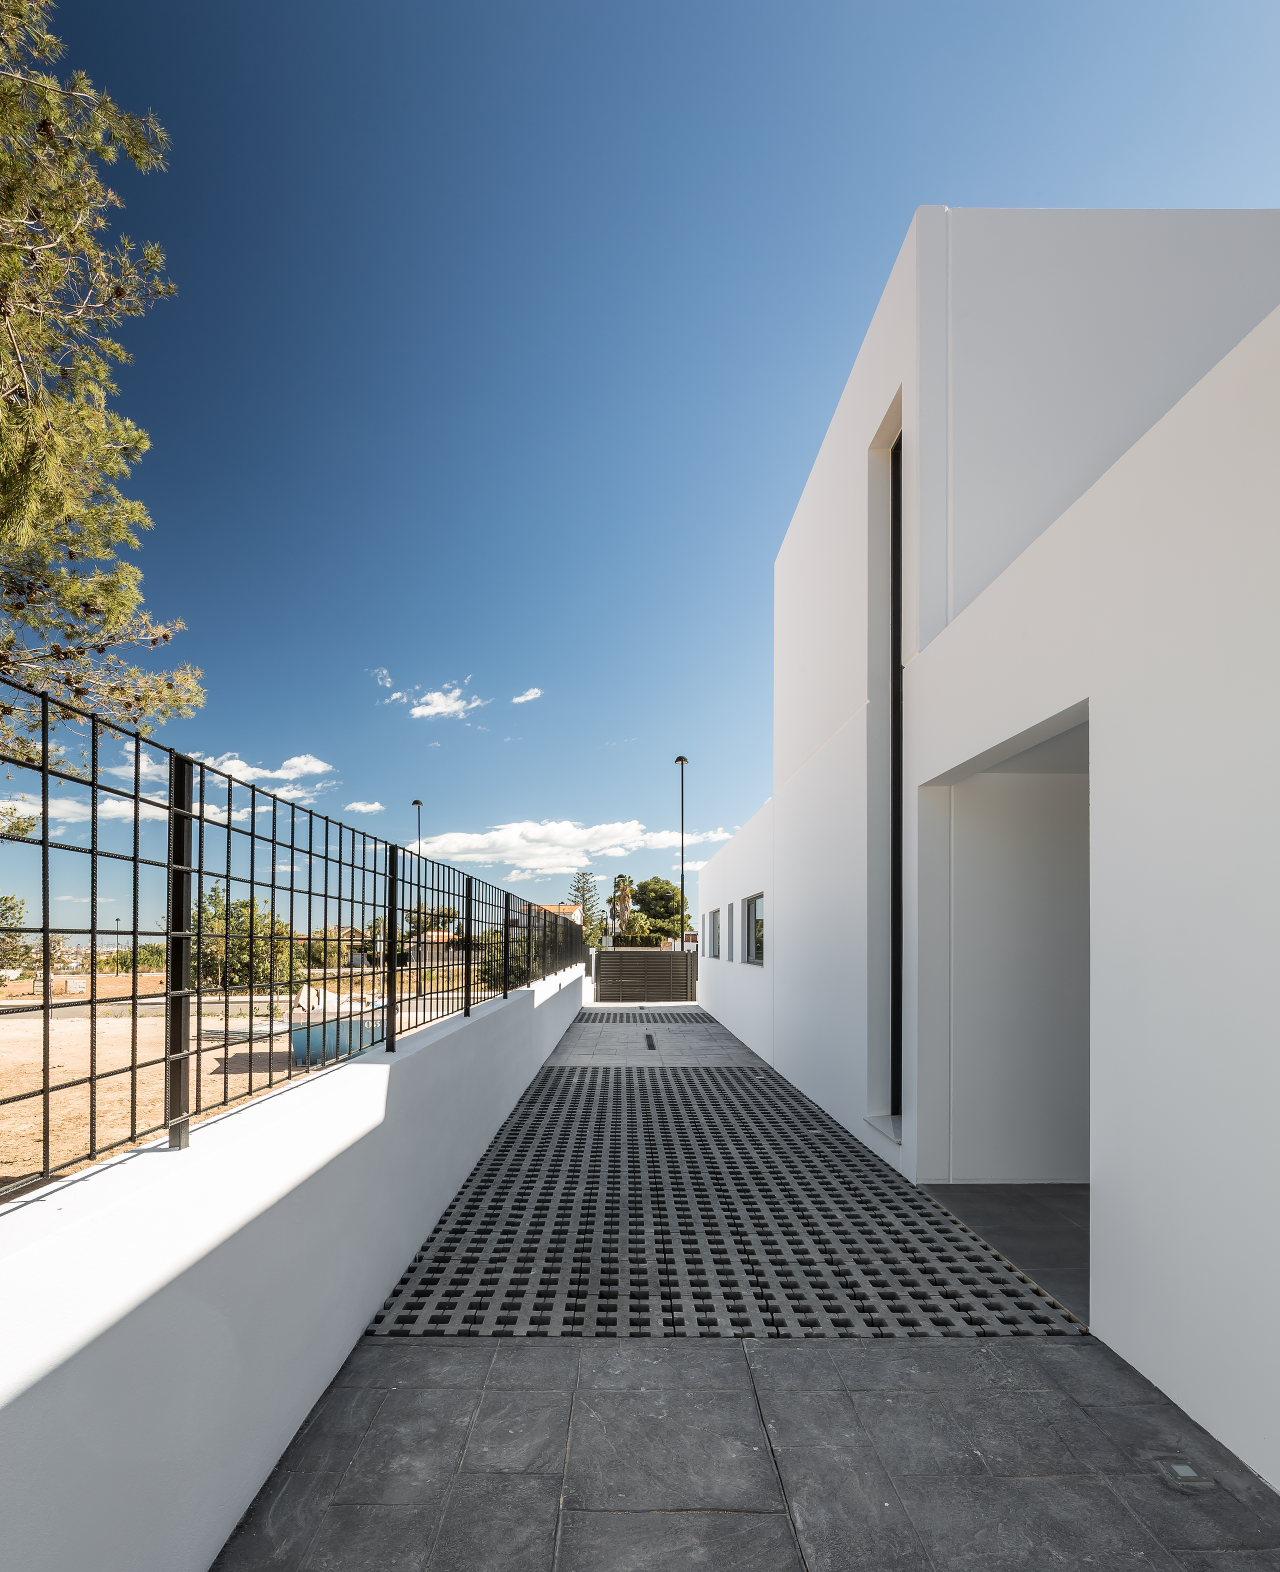 fotografia-arquitectura-valencia-german-cabo-viraje-el-vedat-torrent (9)